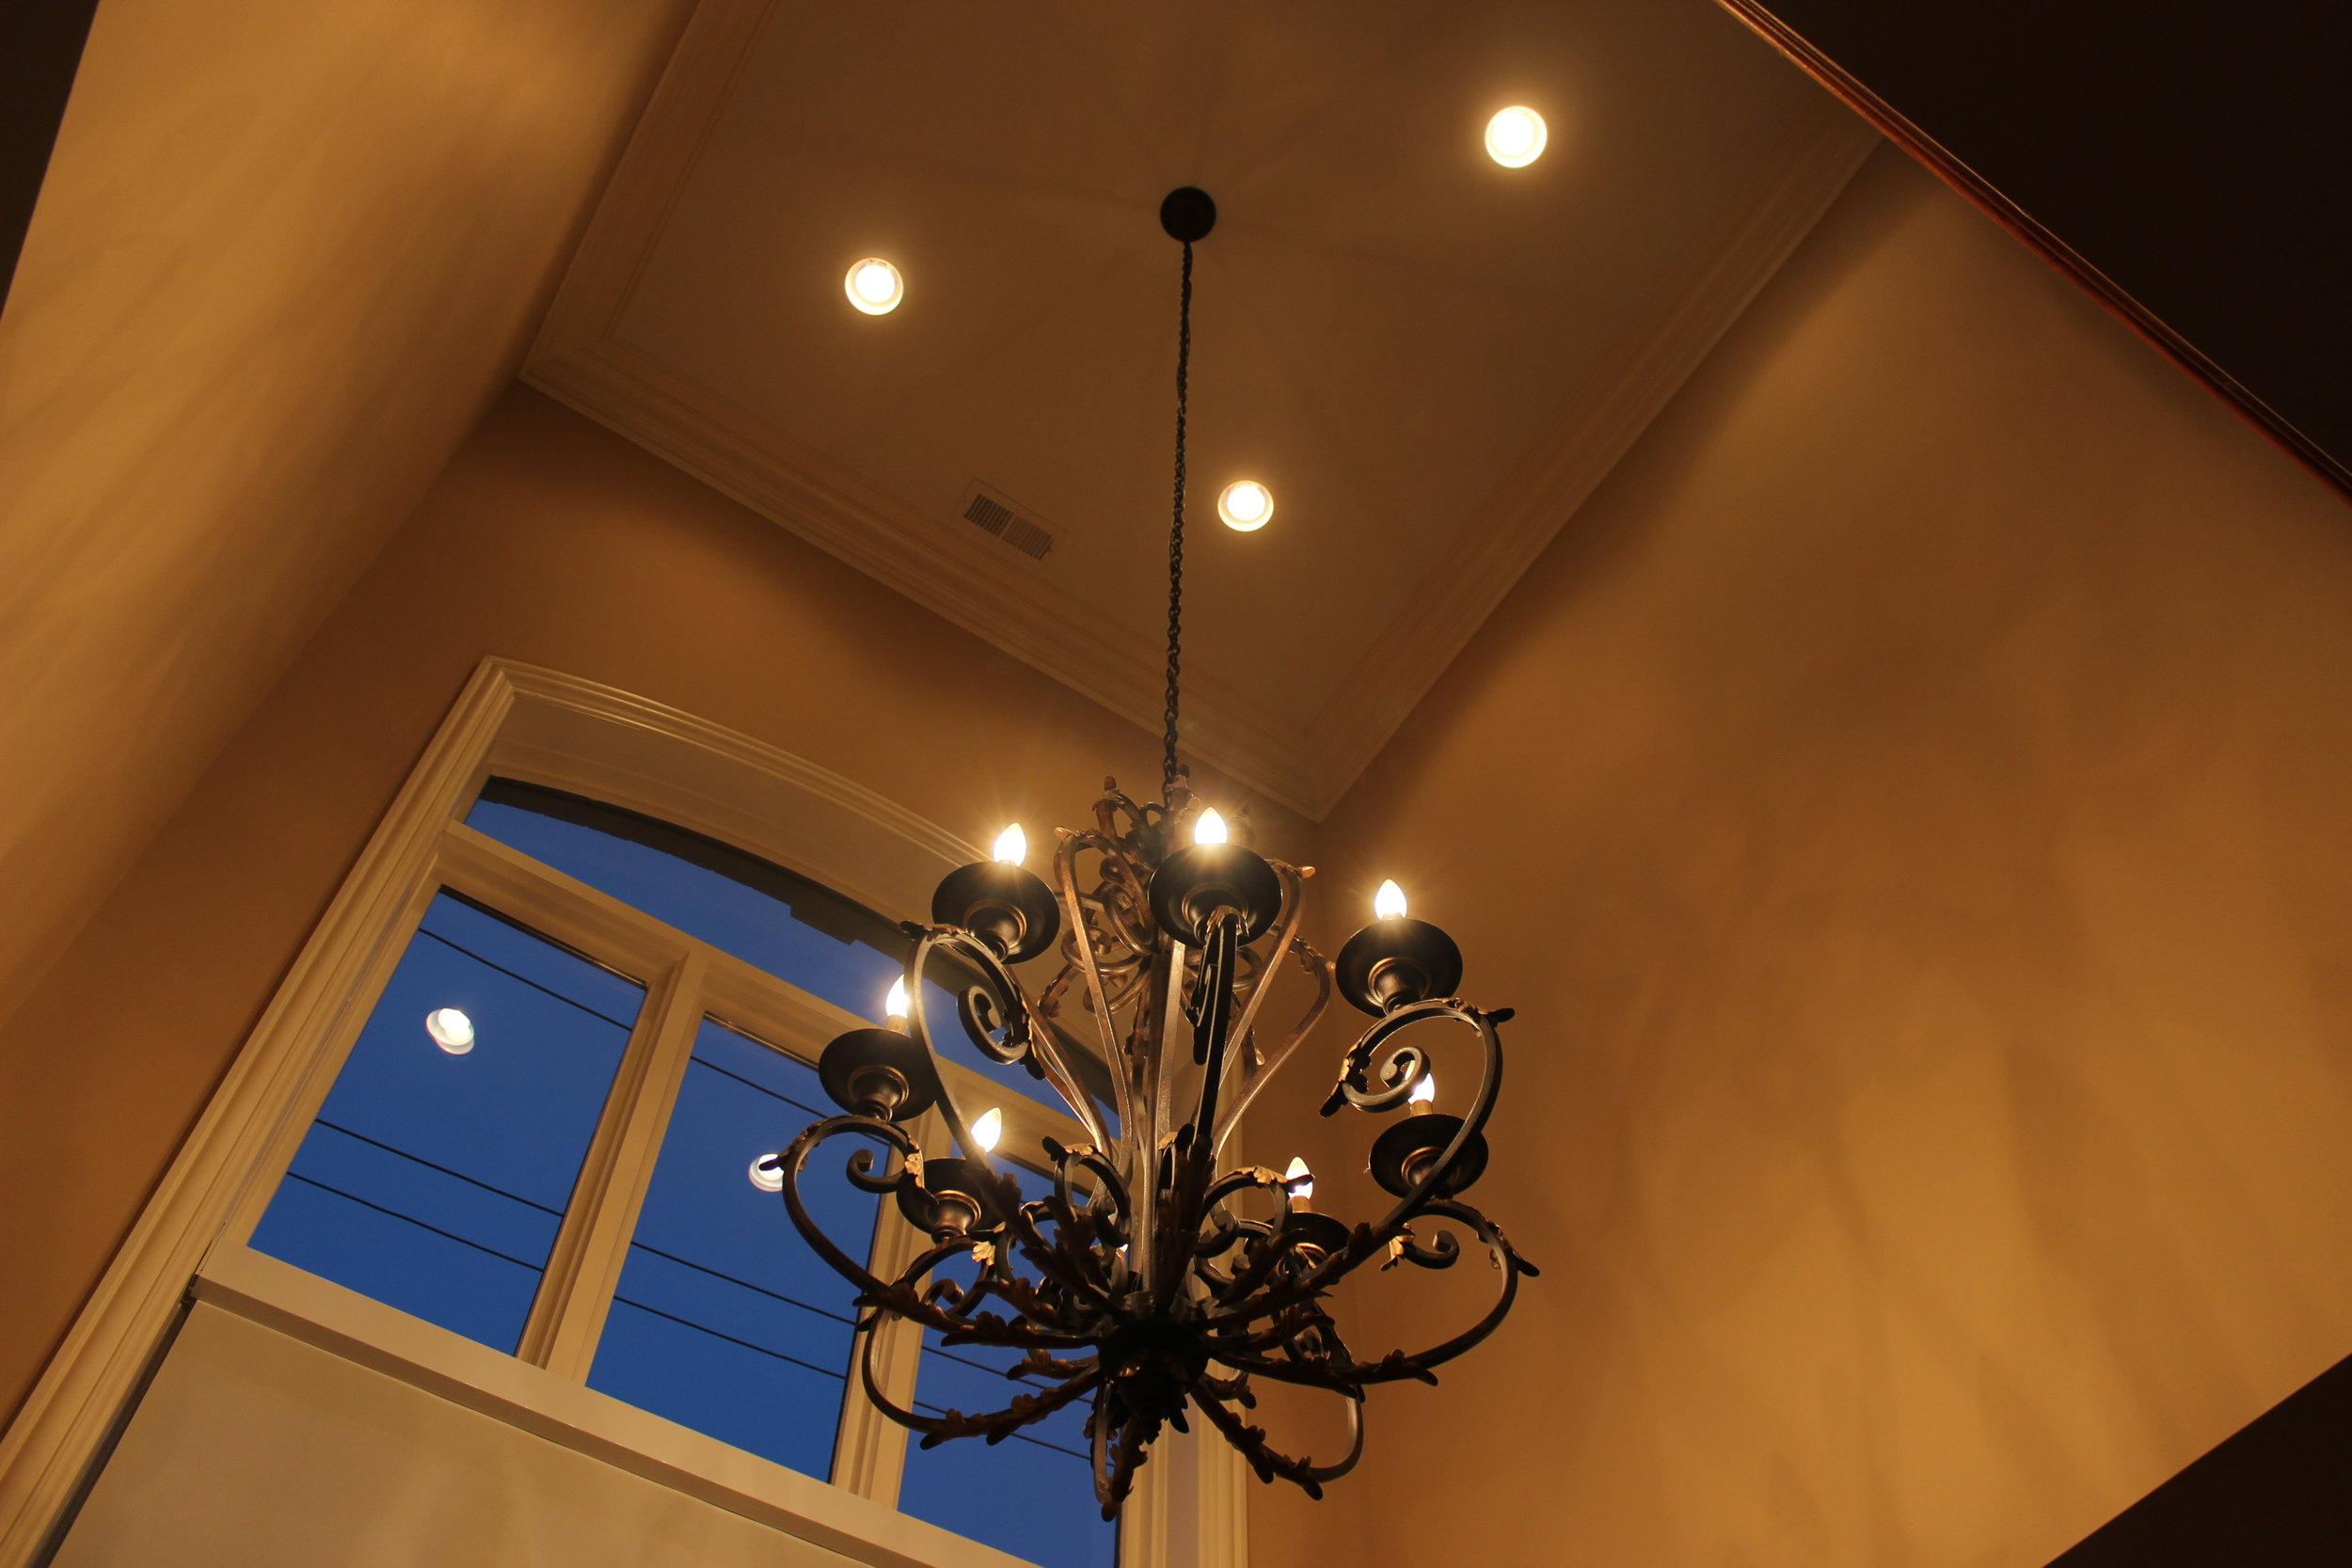 unpatterned-glam-great-room-chicago-interior-design-chandelierbefore